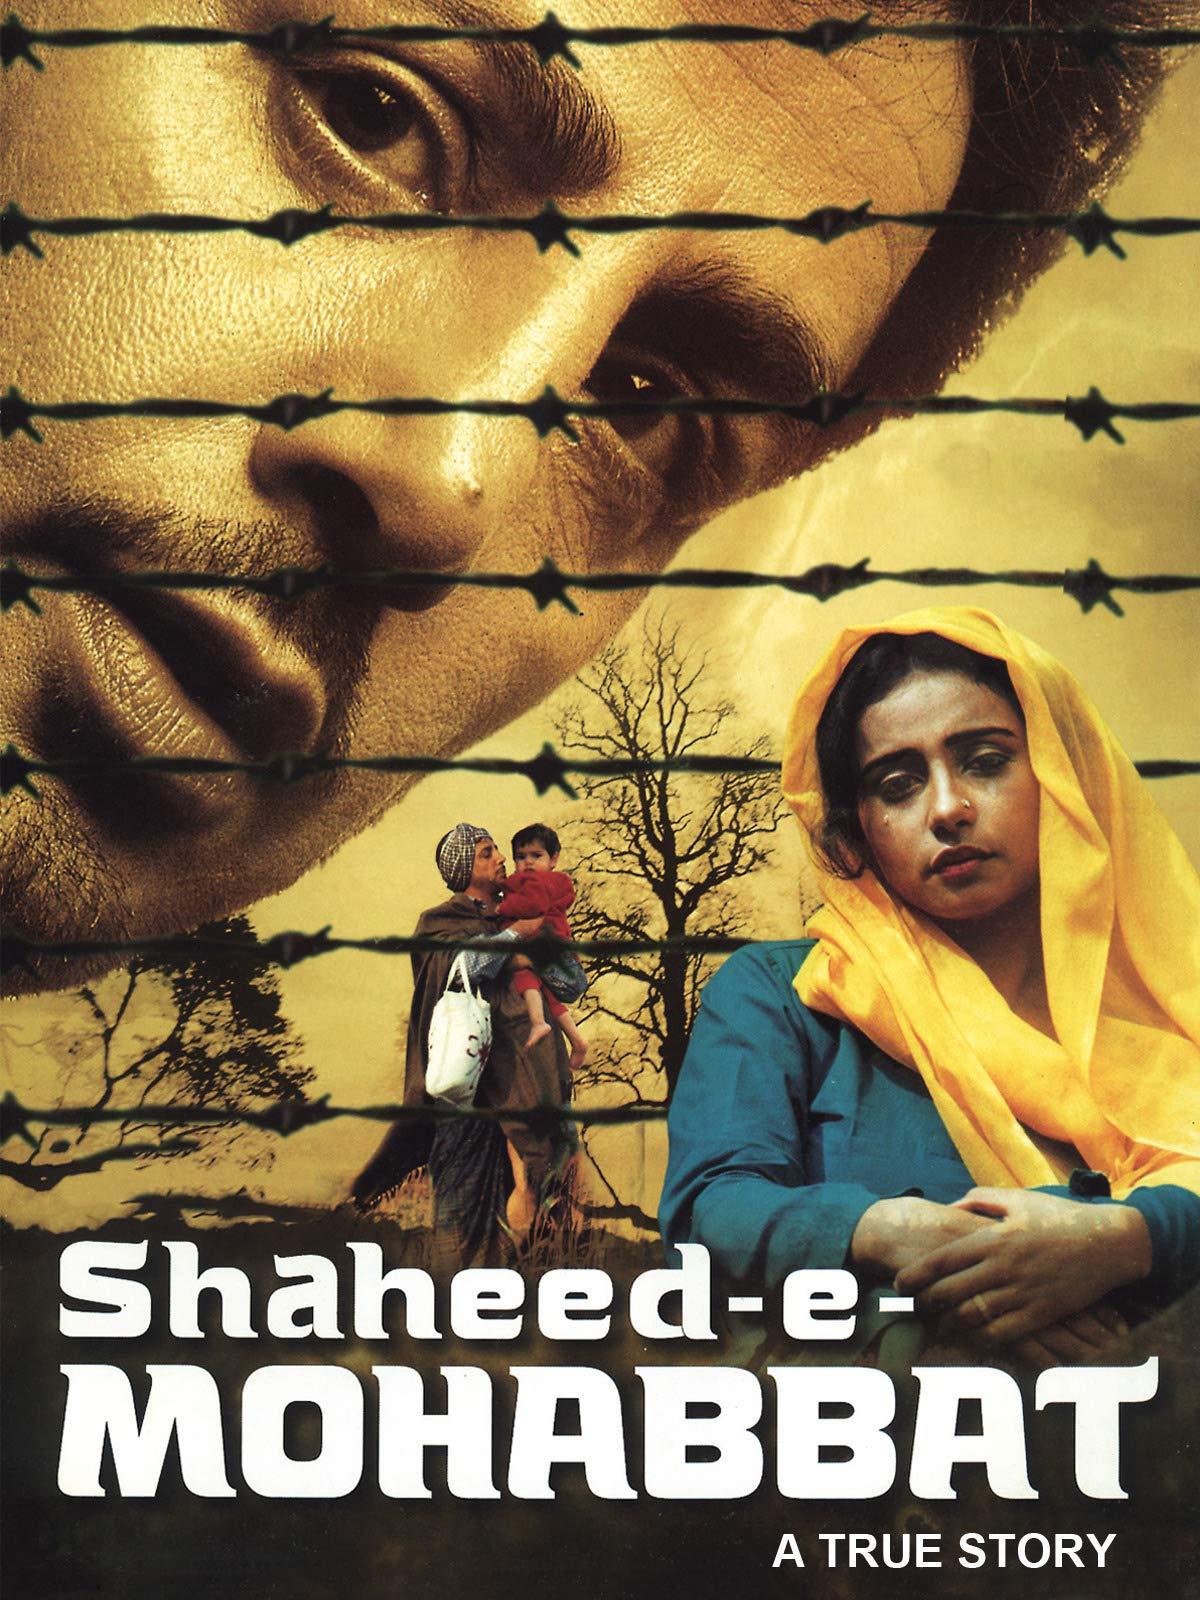 Shaheed E Mohabbat on Amazon Prime Video UK